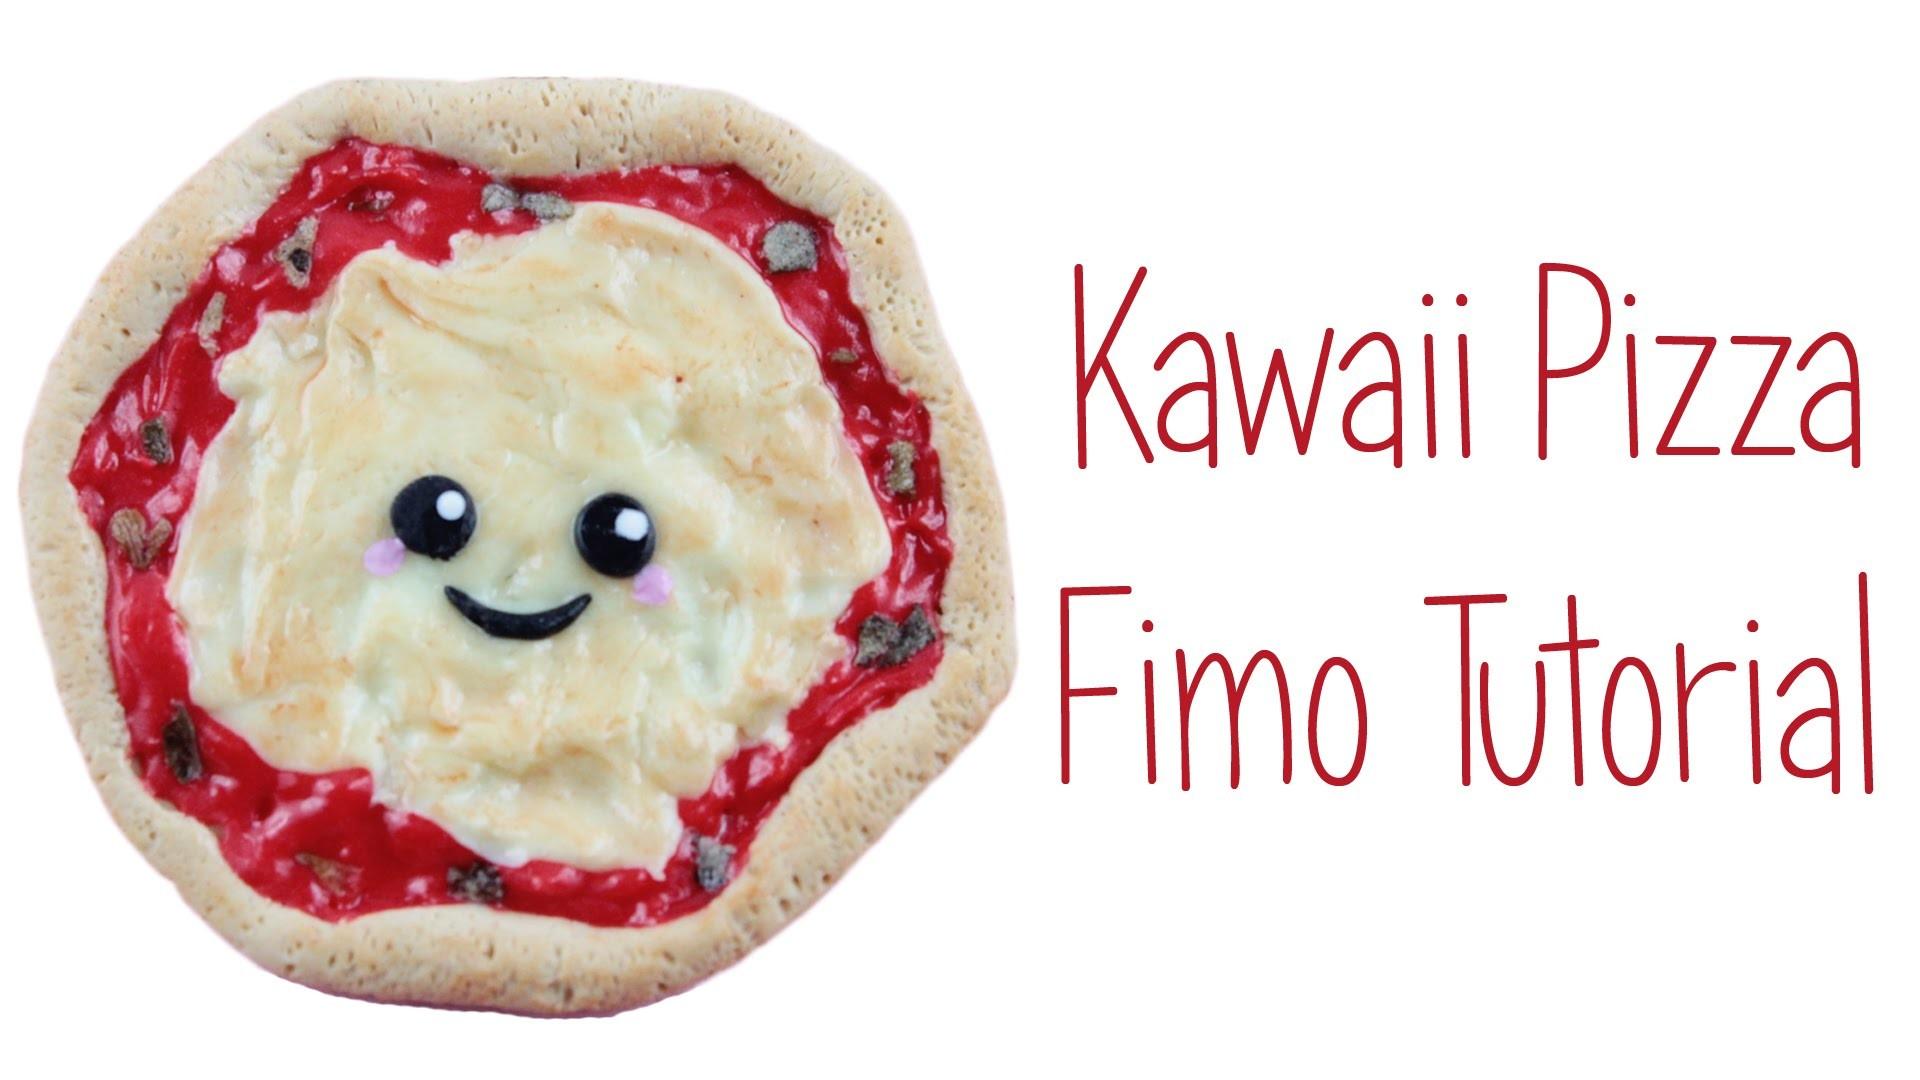 [Fimo Friday] Kawaii Pizza Fimo Tutorial. Kawaii Pizza polymer clay tutorial  | Anielas Fimo